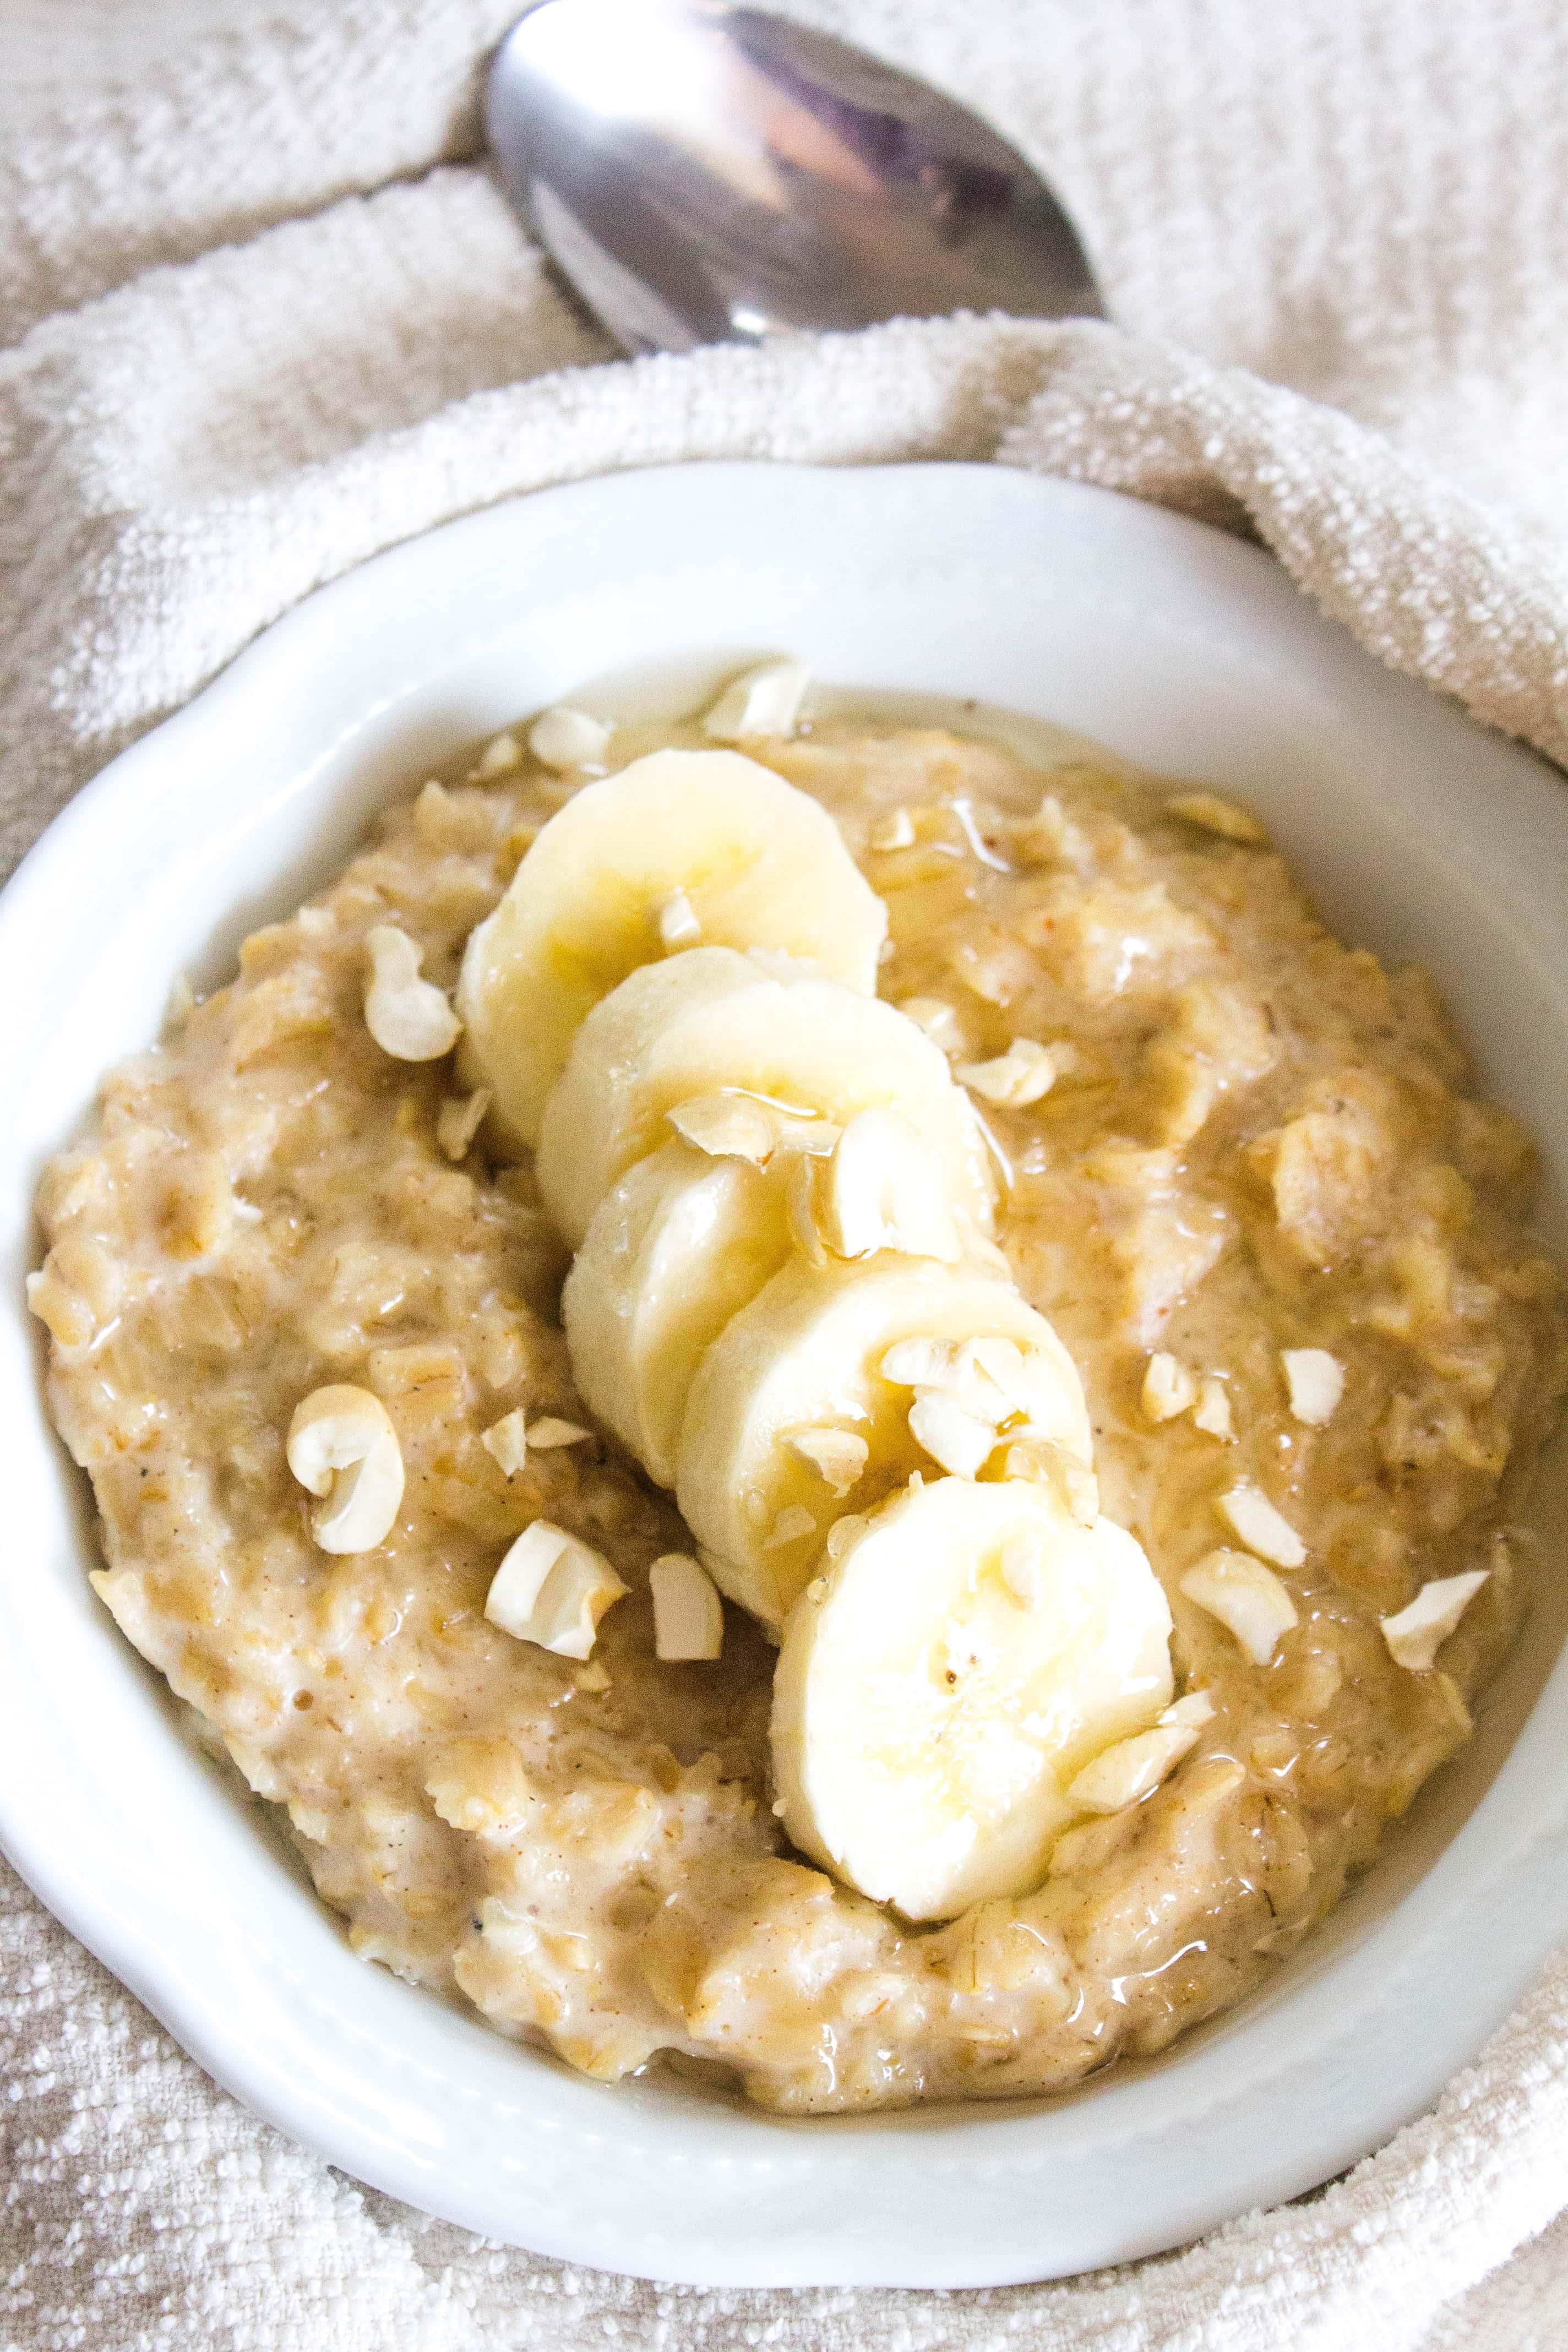 Peanut Butter Banana Bread Oatmeal